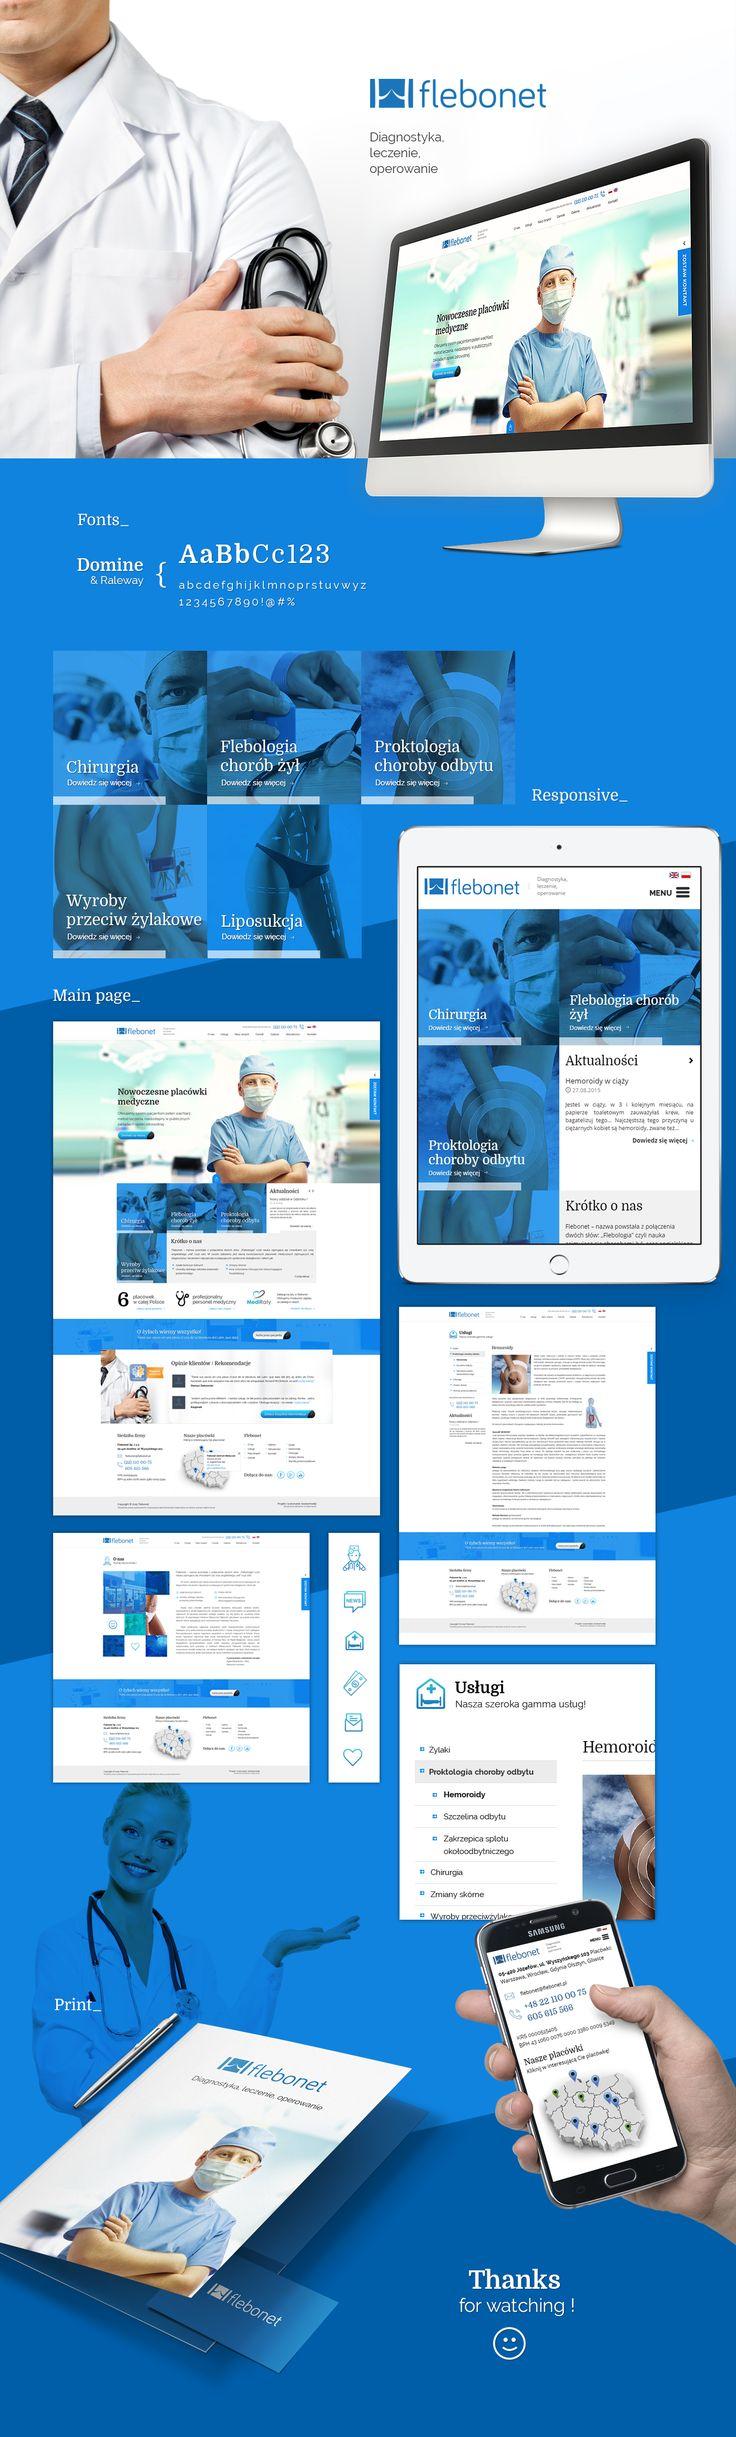 Flebonet - Medic centrum on Behance